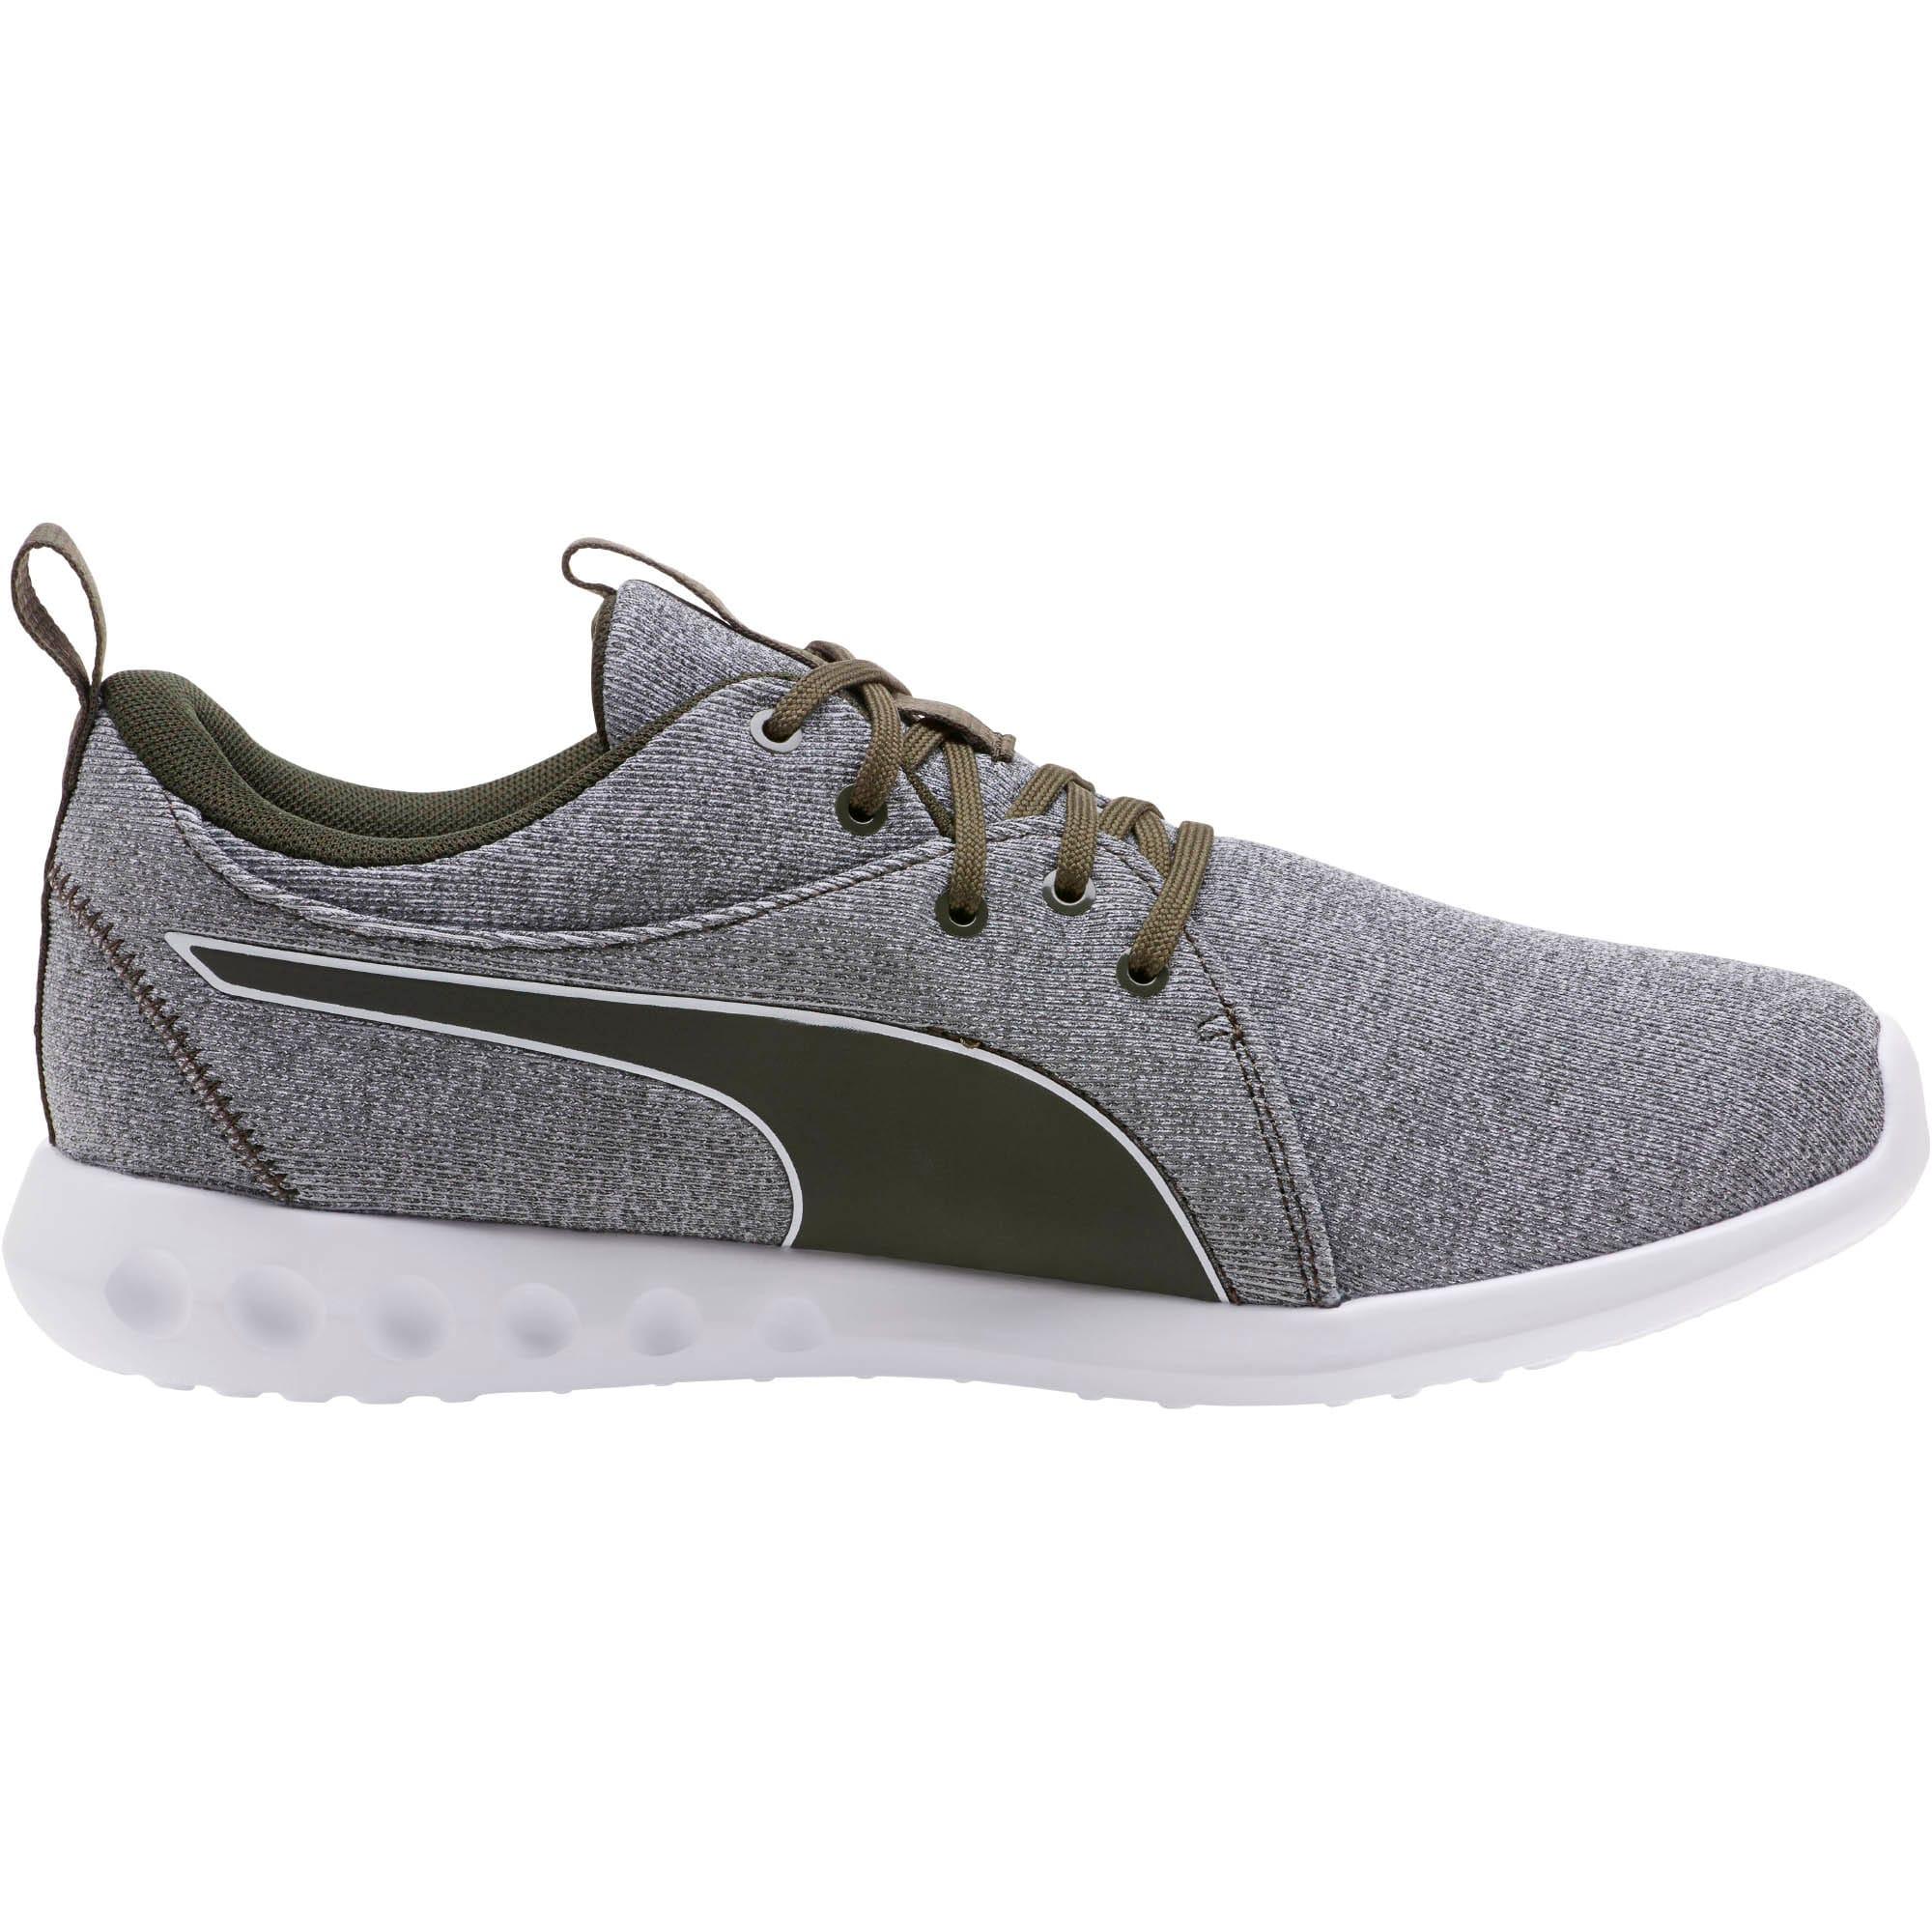 Thumbnail 3 of Carson 2 Men's Nautical Running Shoes, Forest Night-Puma White, medium